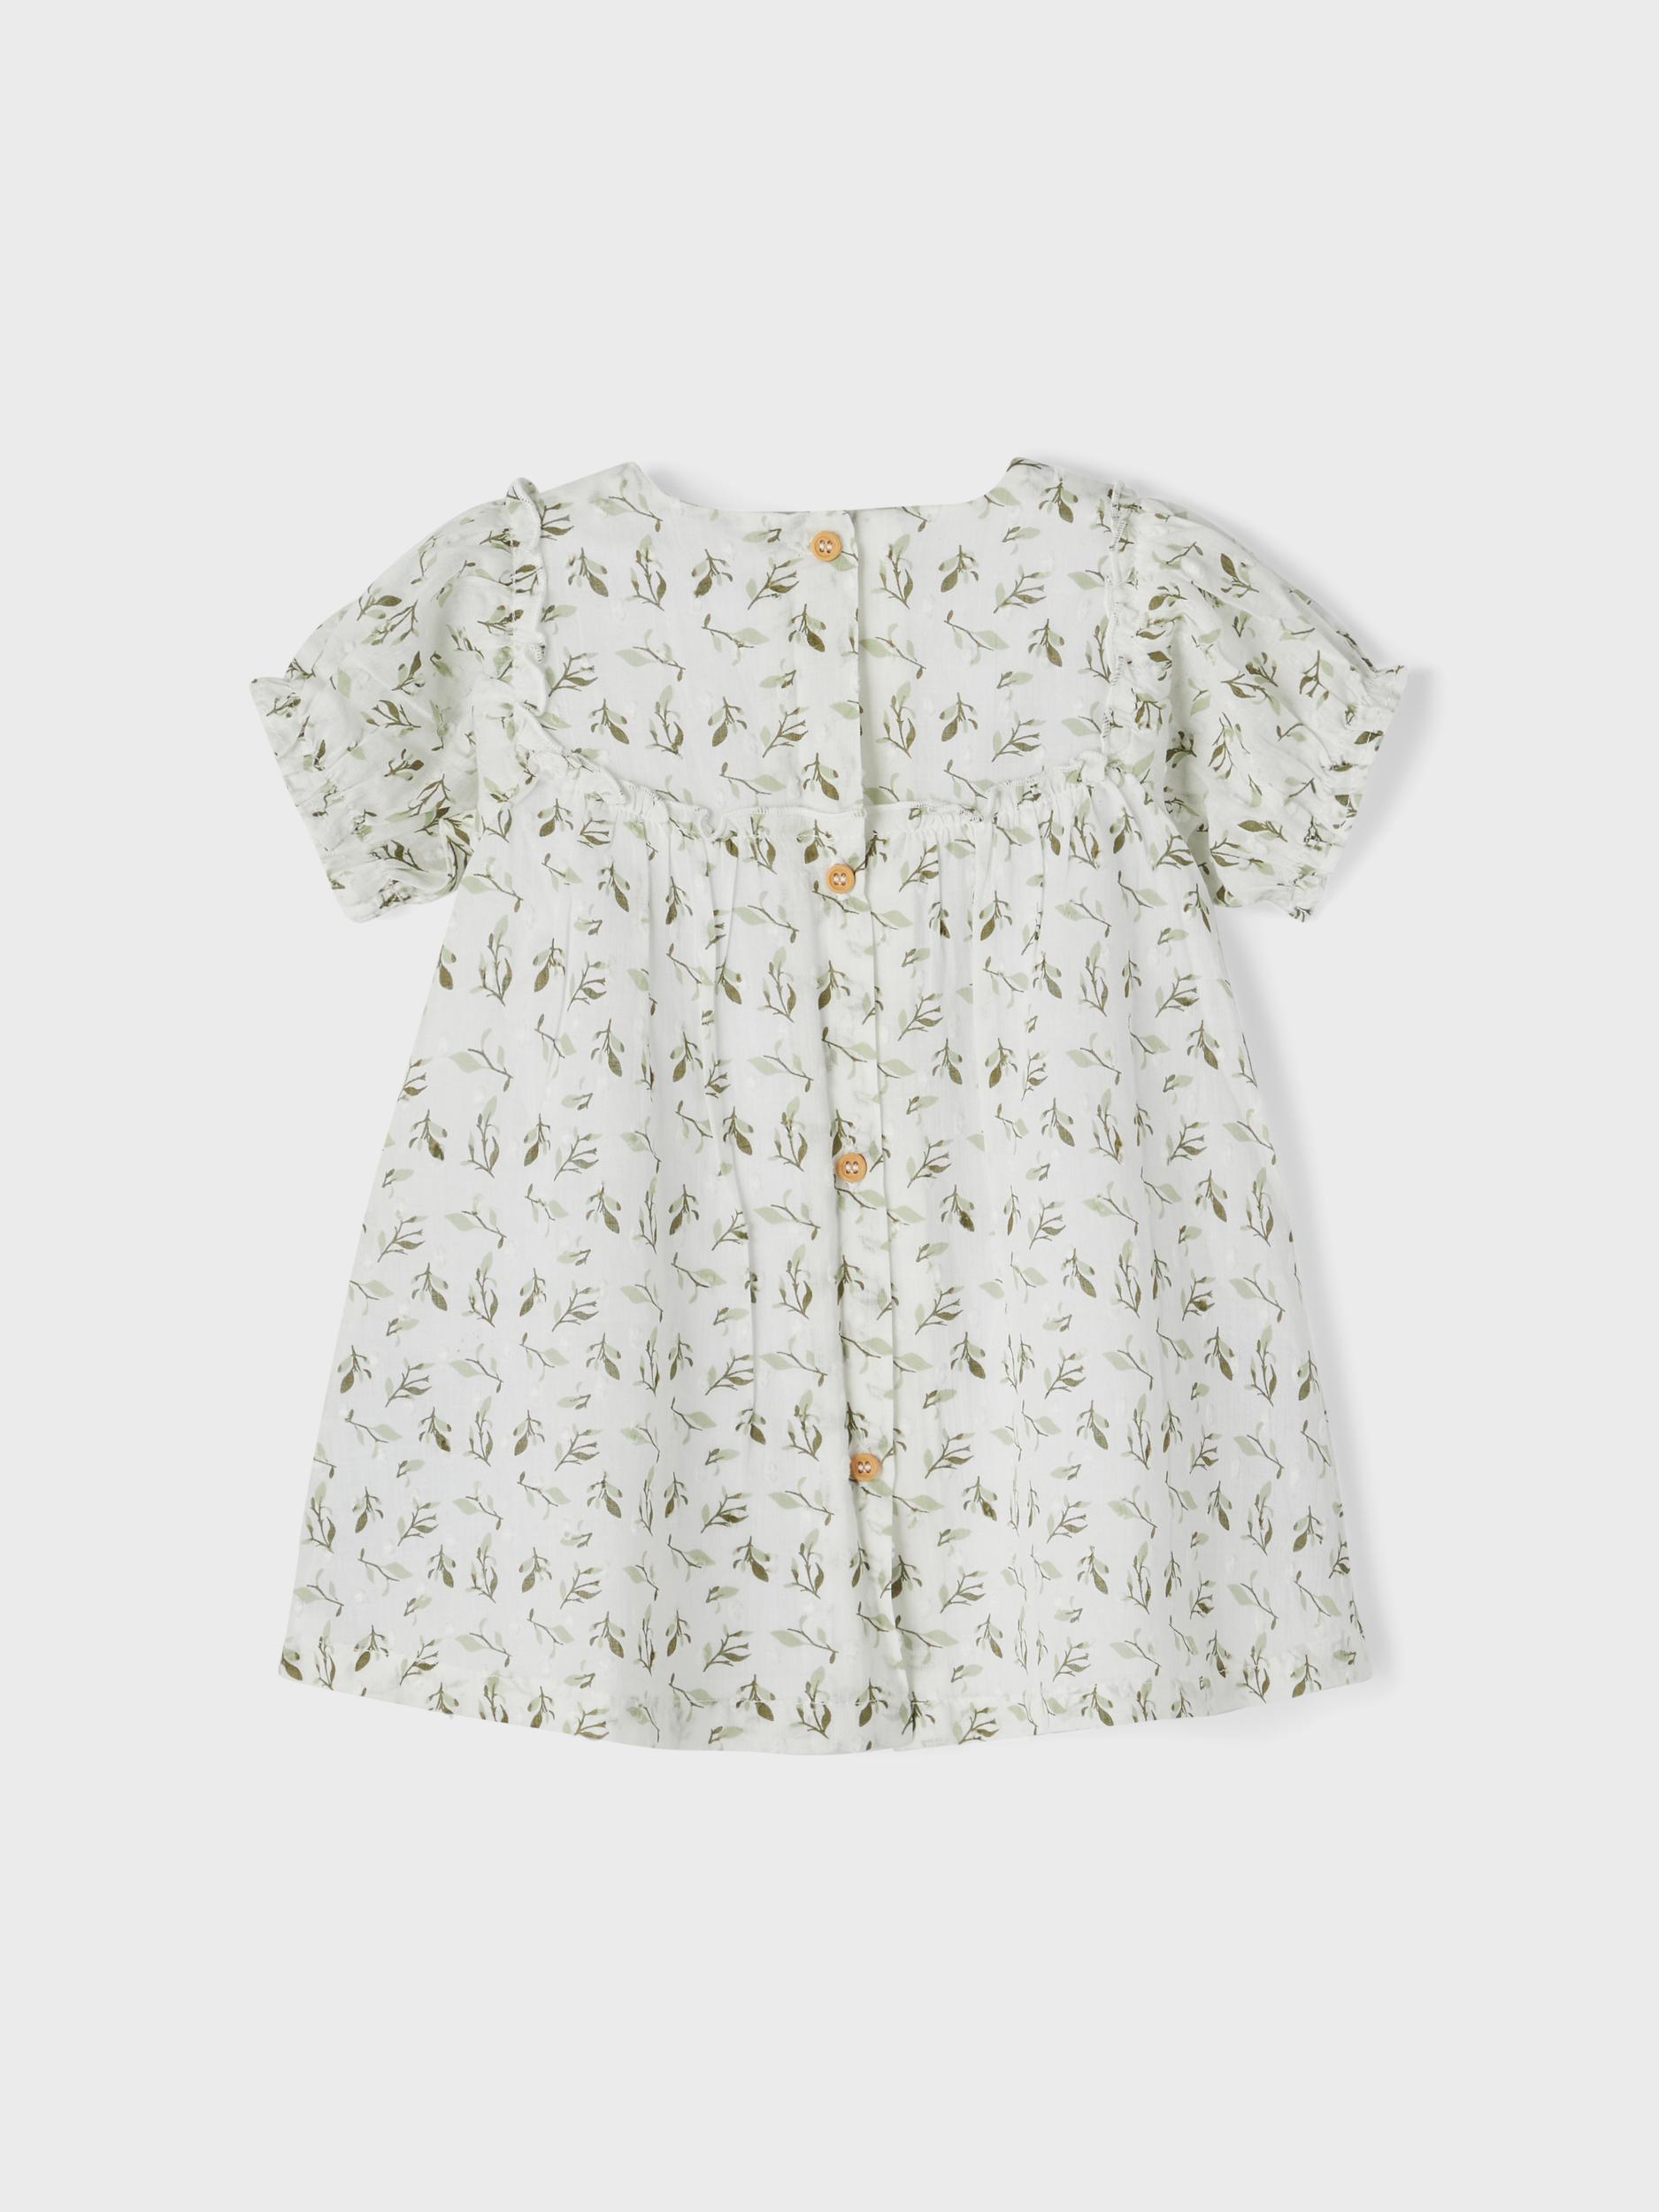 Name It Hajette SS kjole, bright white, 74